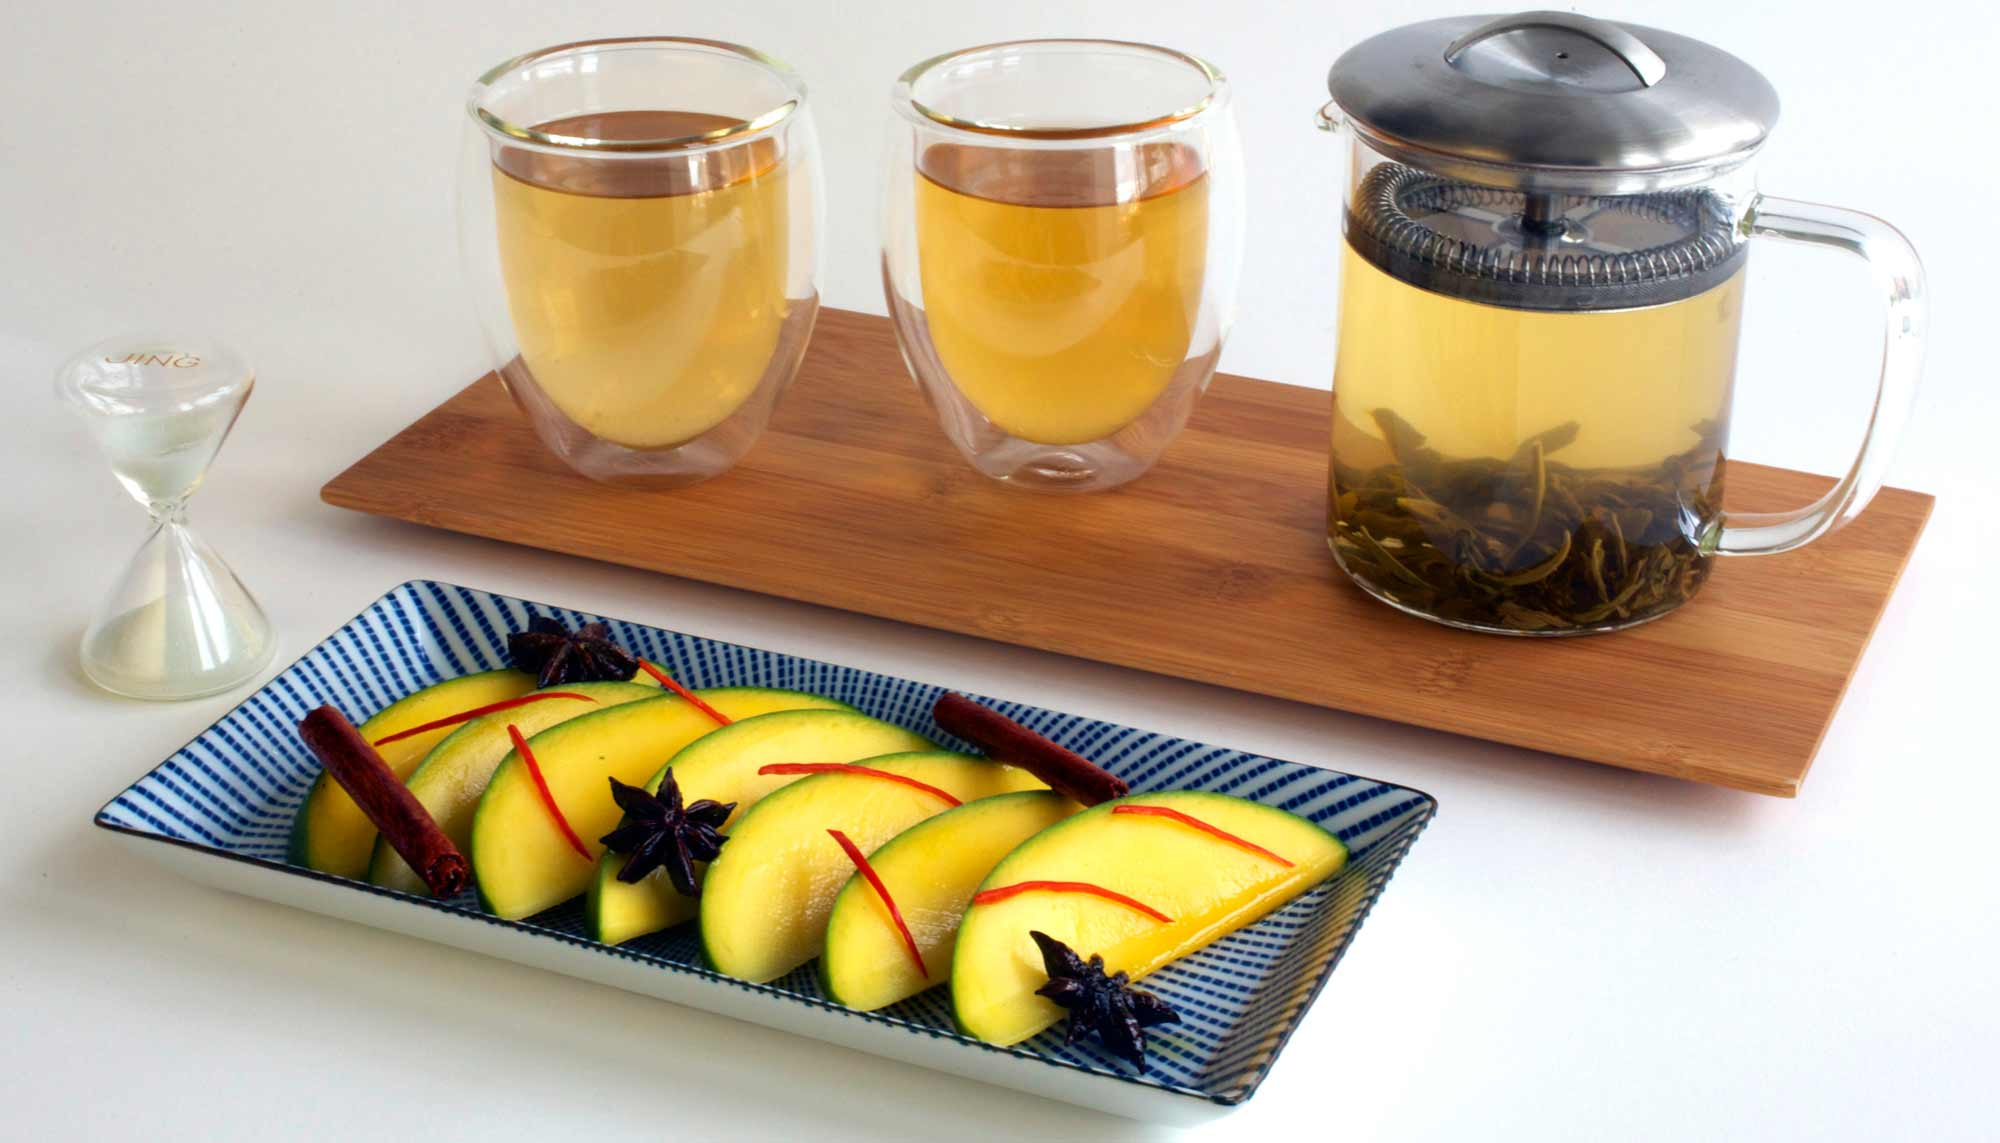 Tea-iere Set of Jasmine Pearls with Fresh Mango Dessert